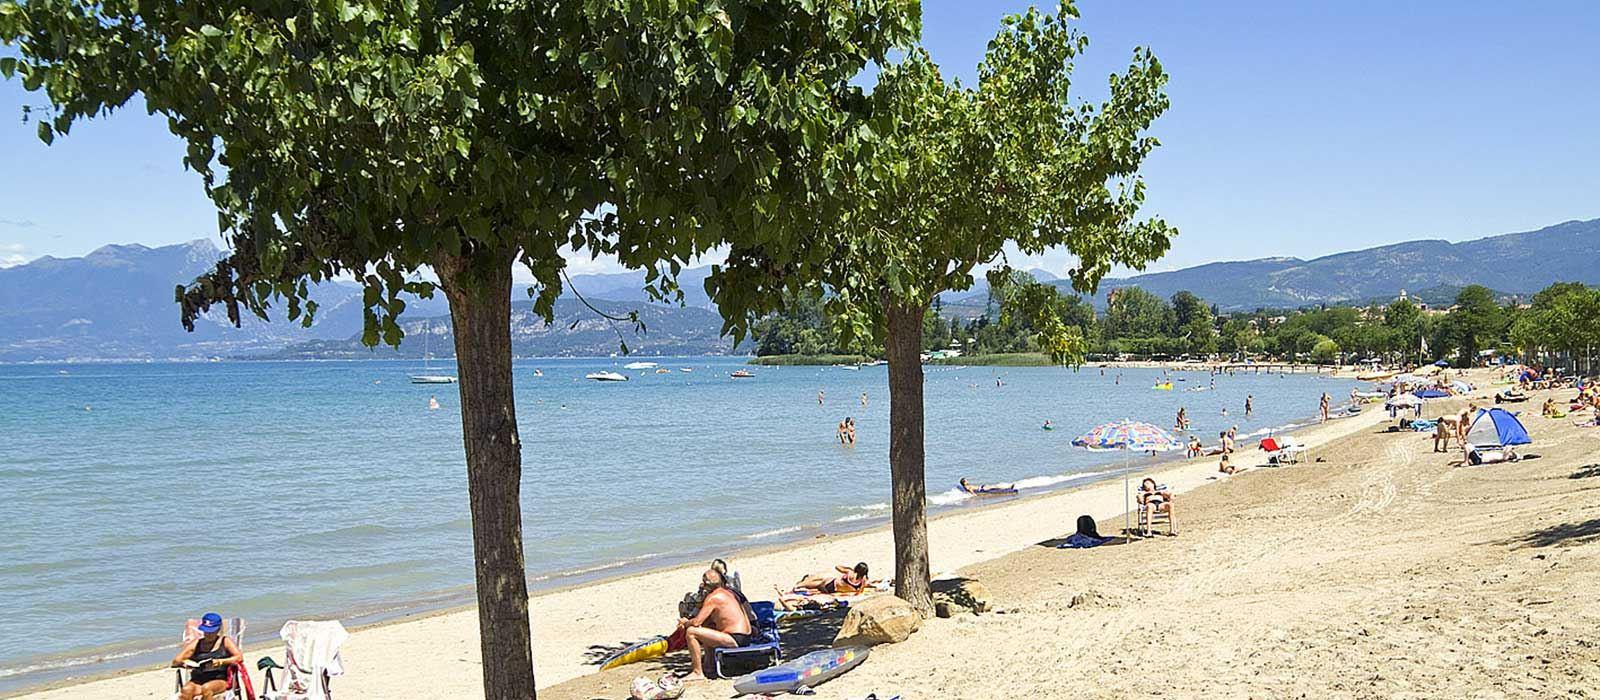 Airports close to Lake Como, Milan Malpensa, Linate ...